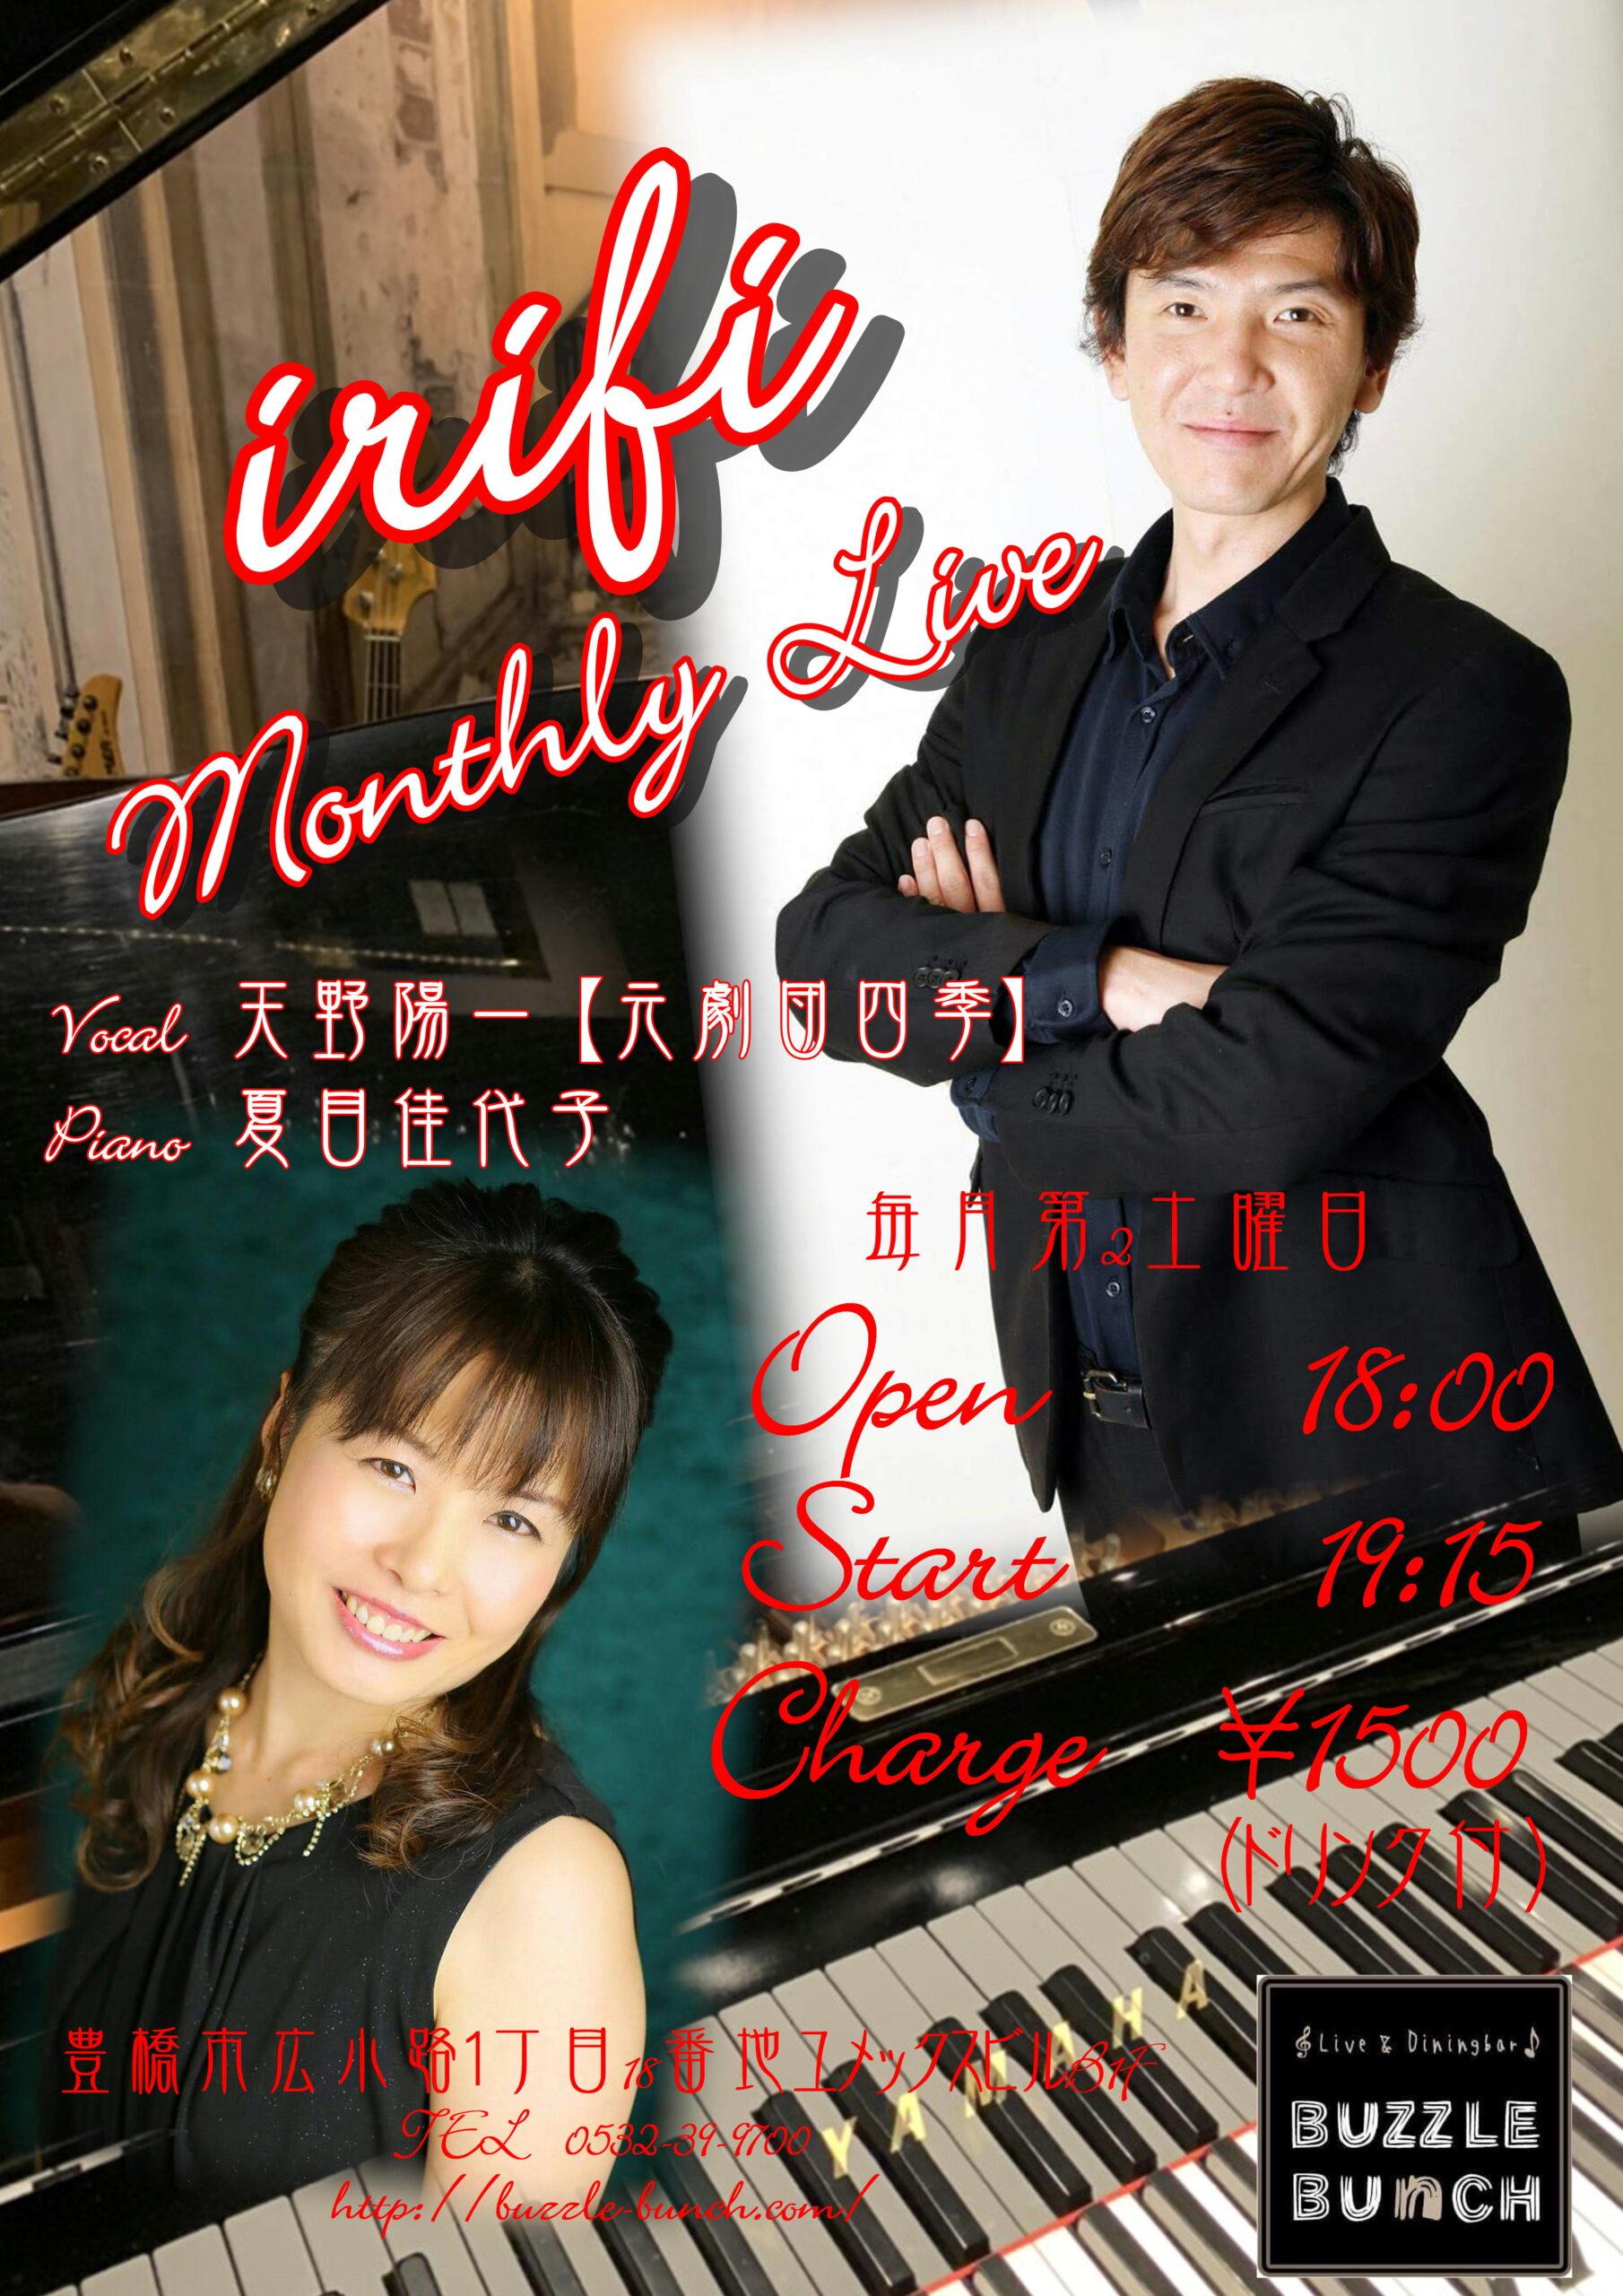 2021年6月12日(土) ~irifi~ Monthly  Live